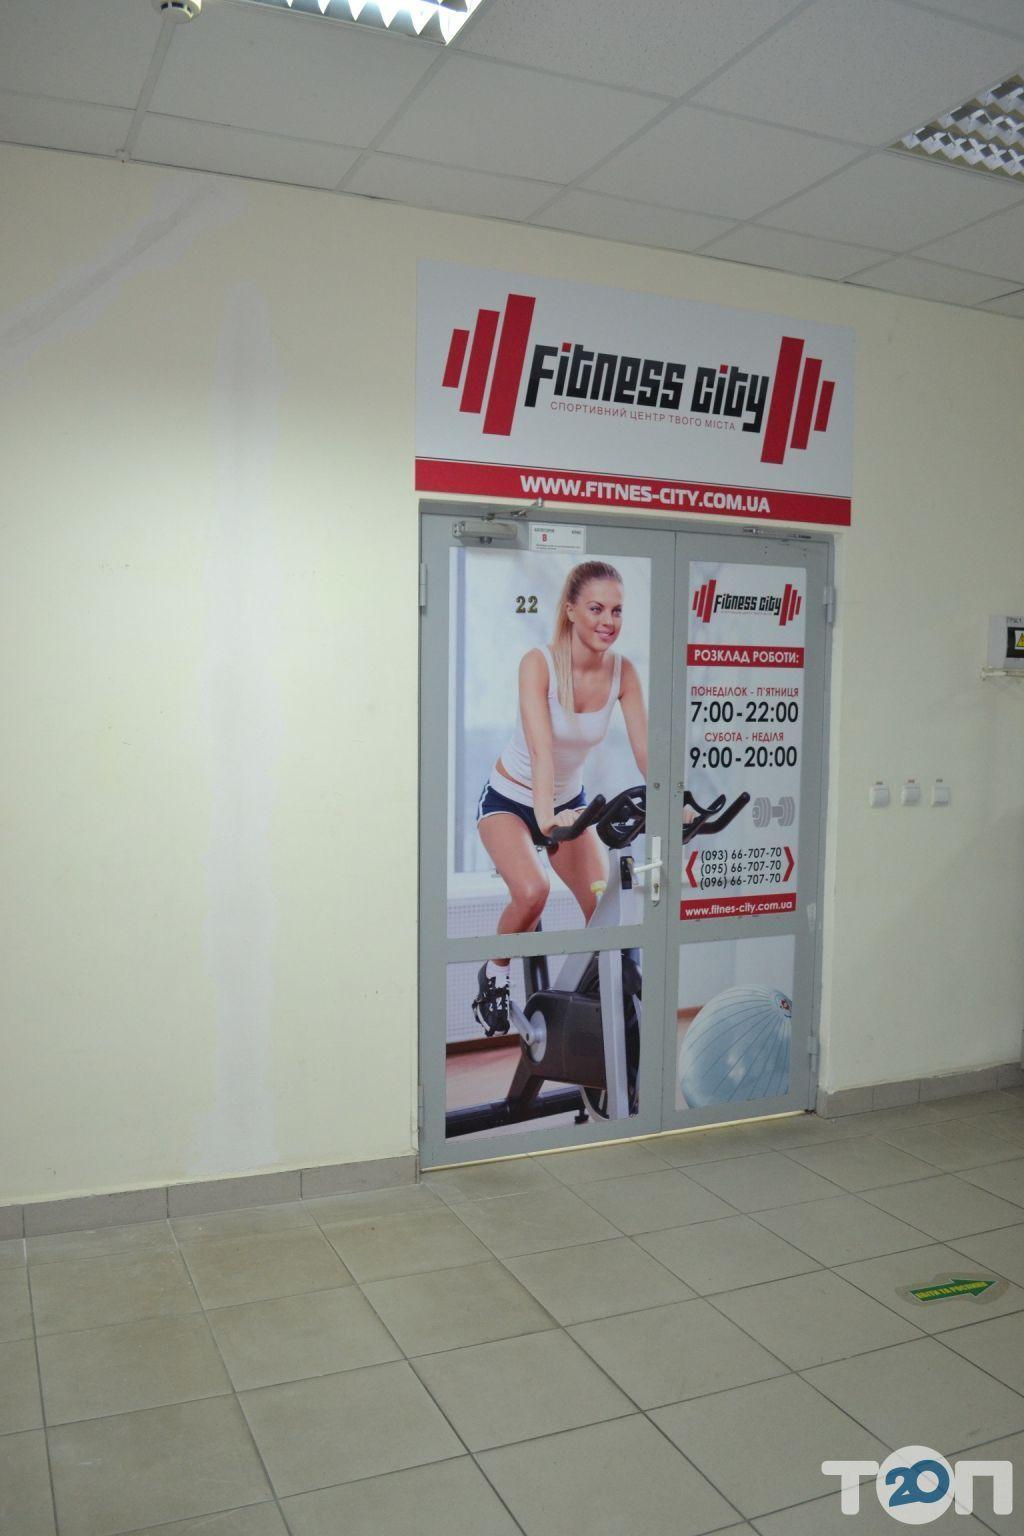 Fitness City, фітнес центр - фото 5